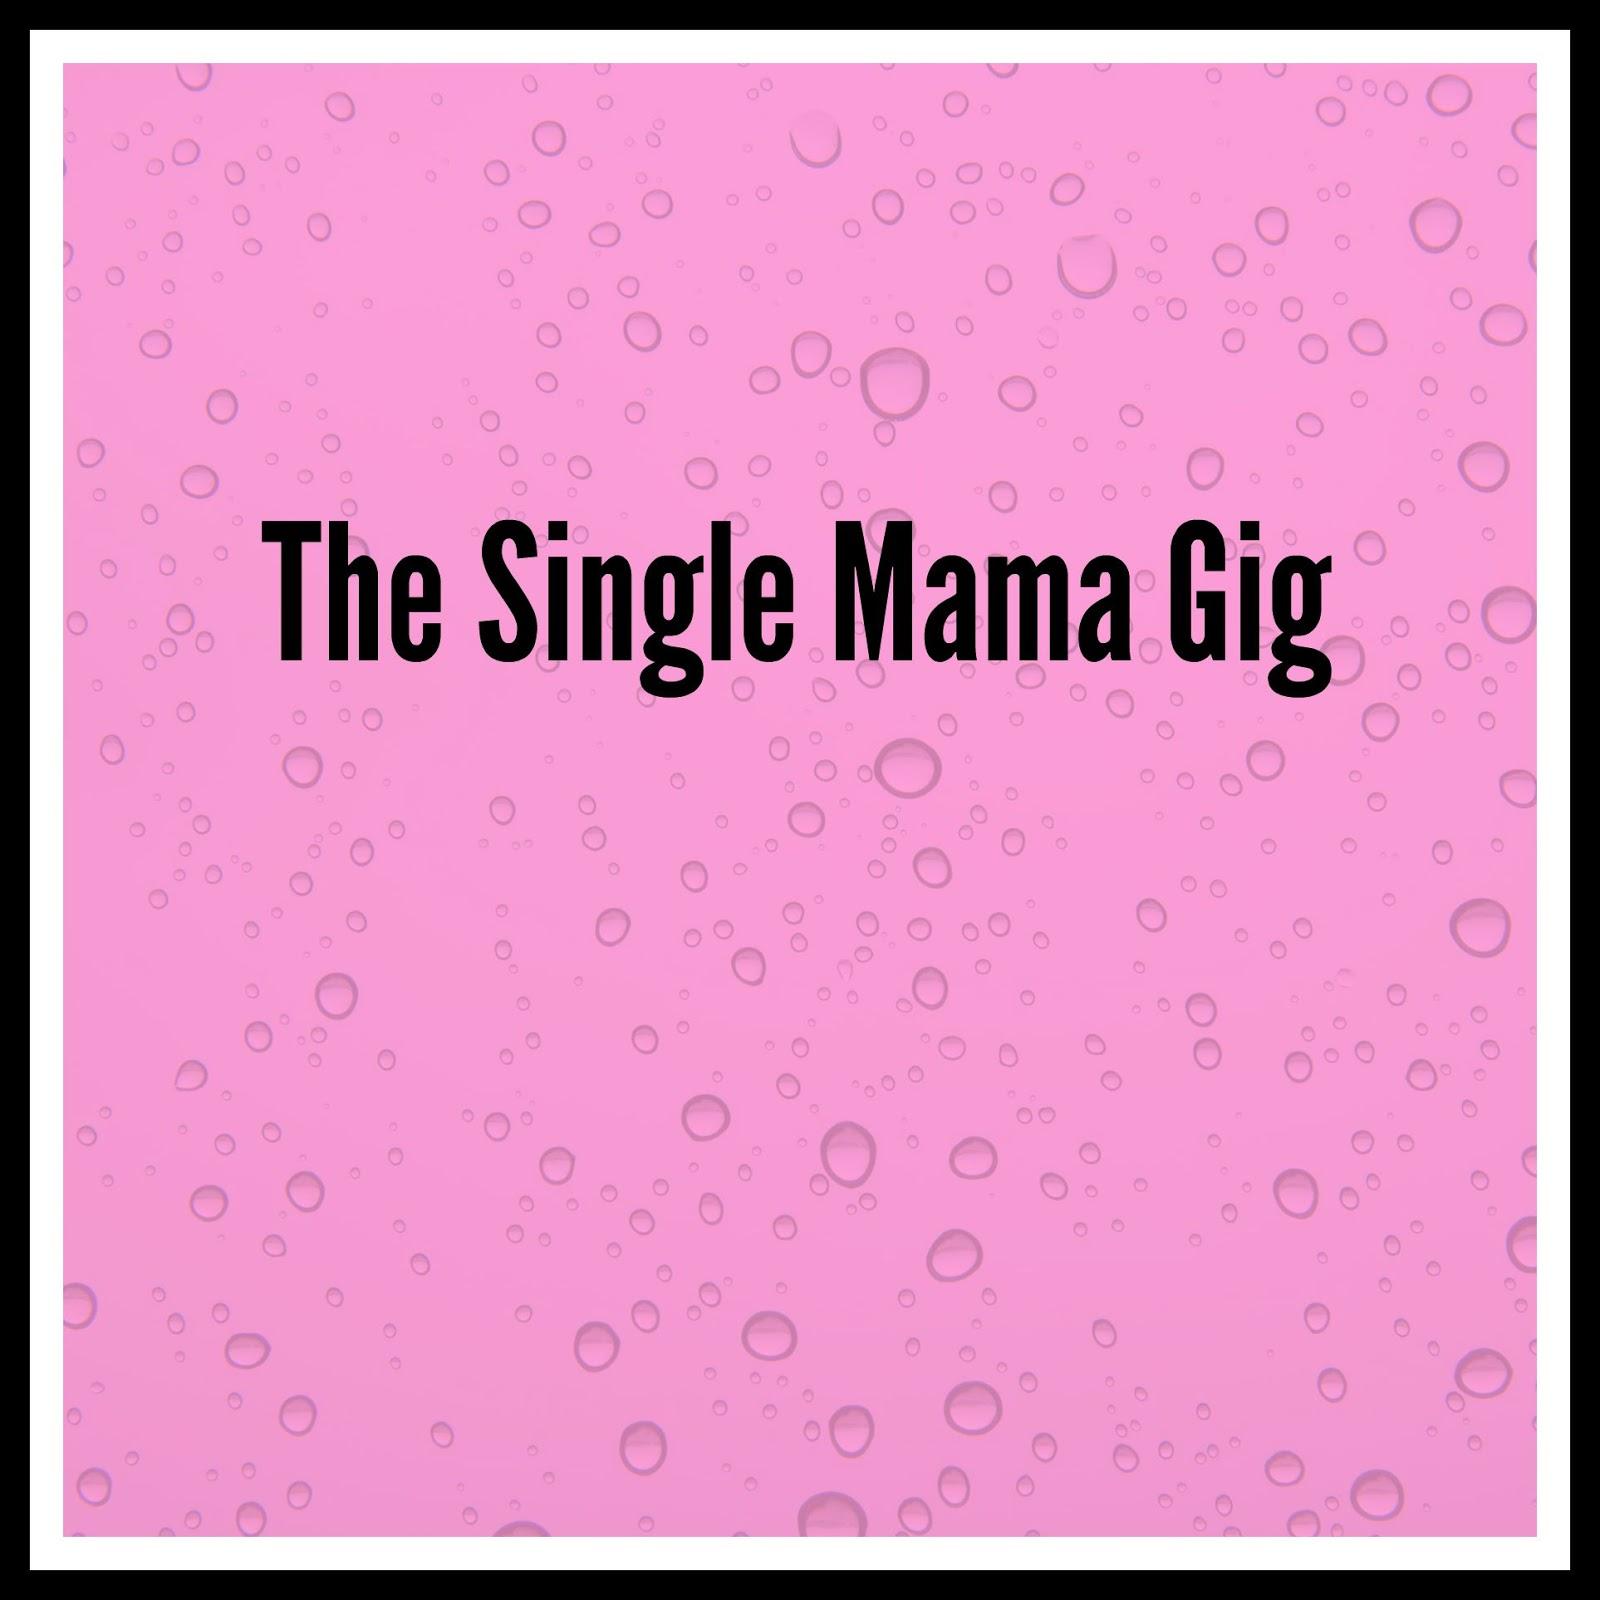 www single mama com